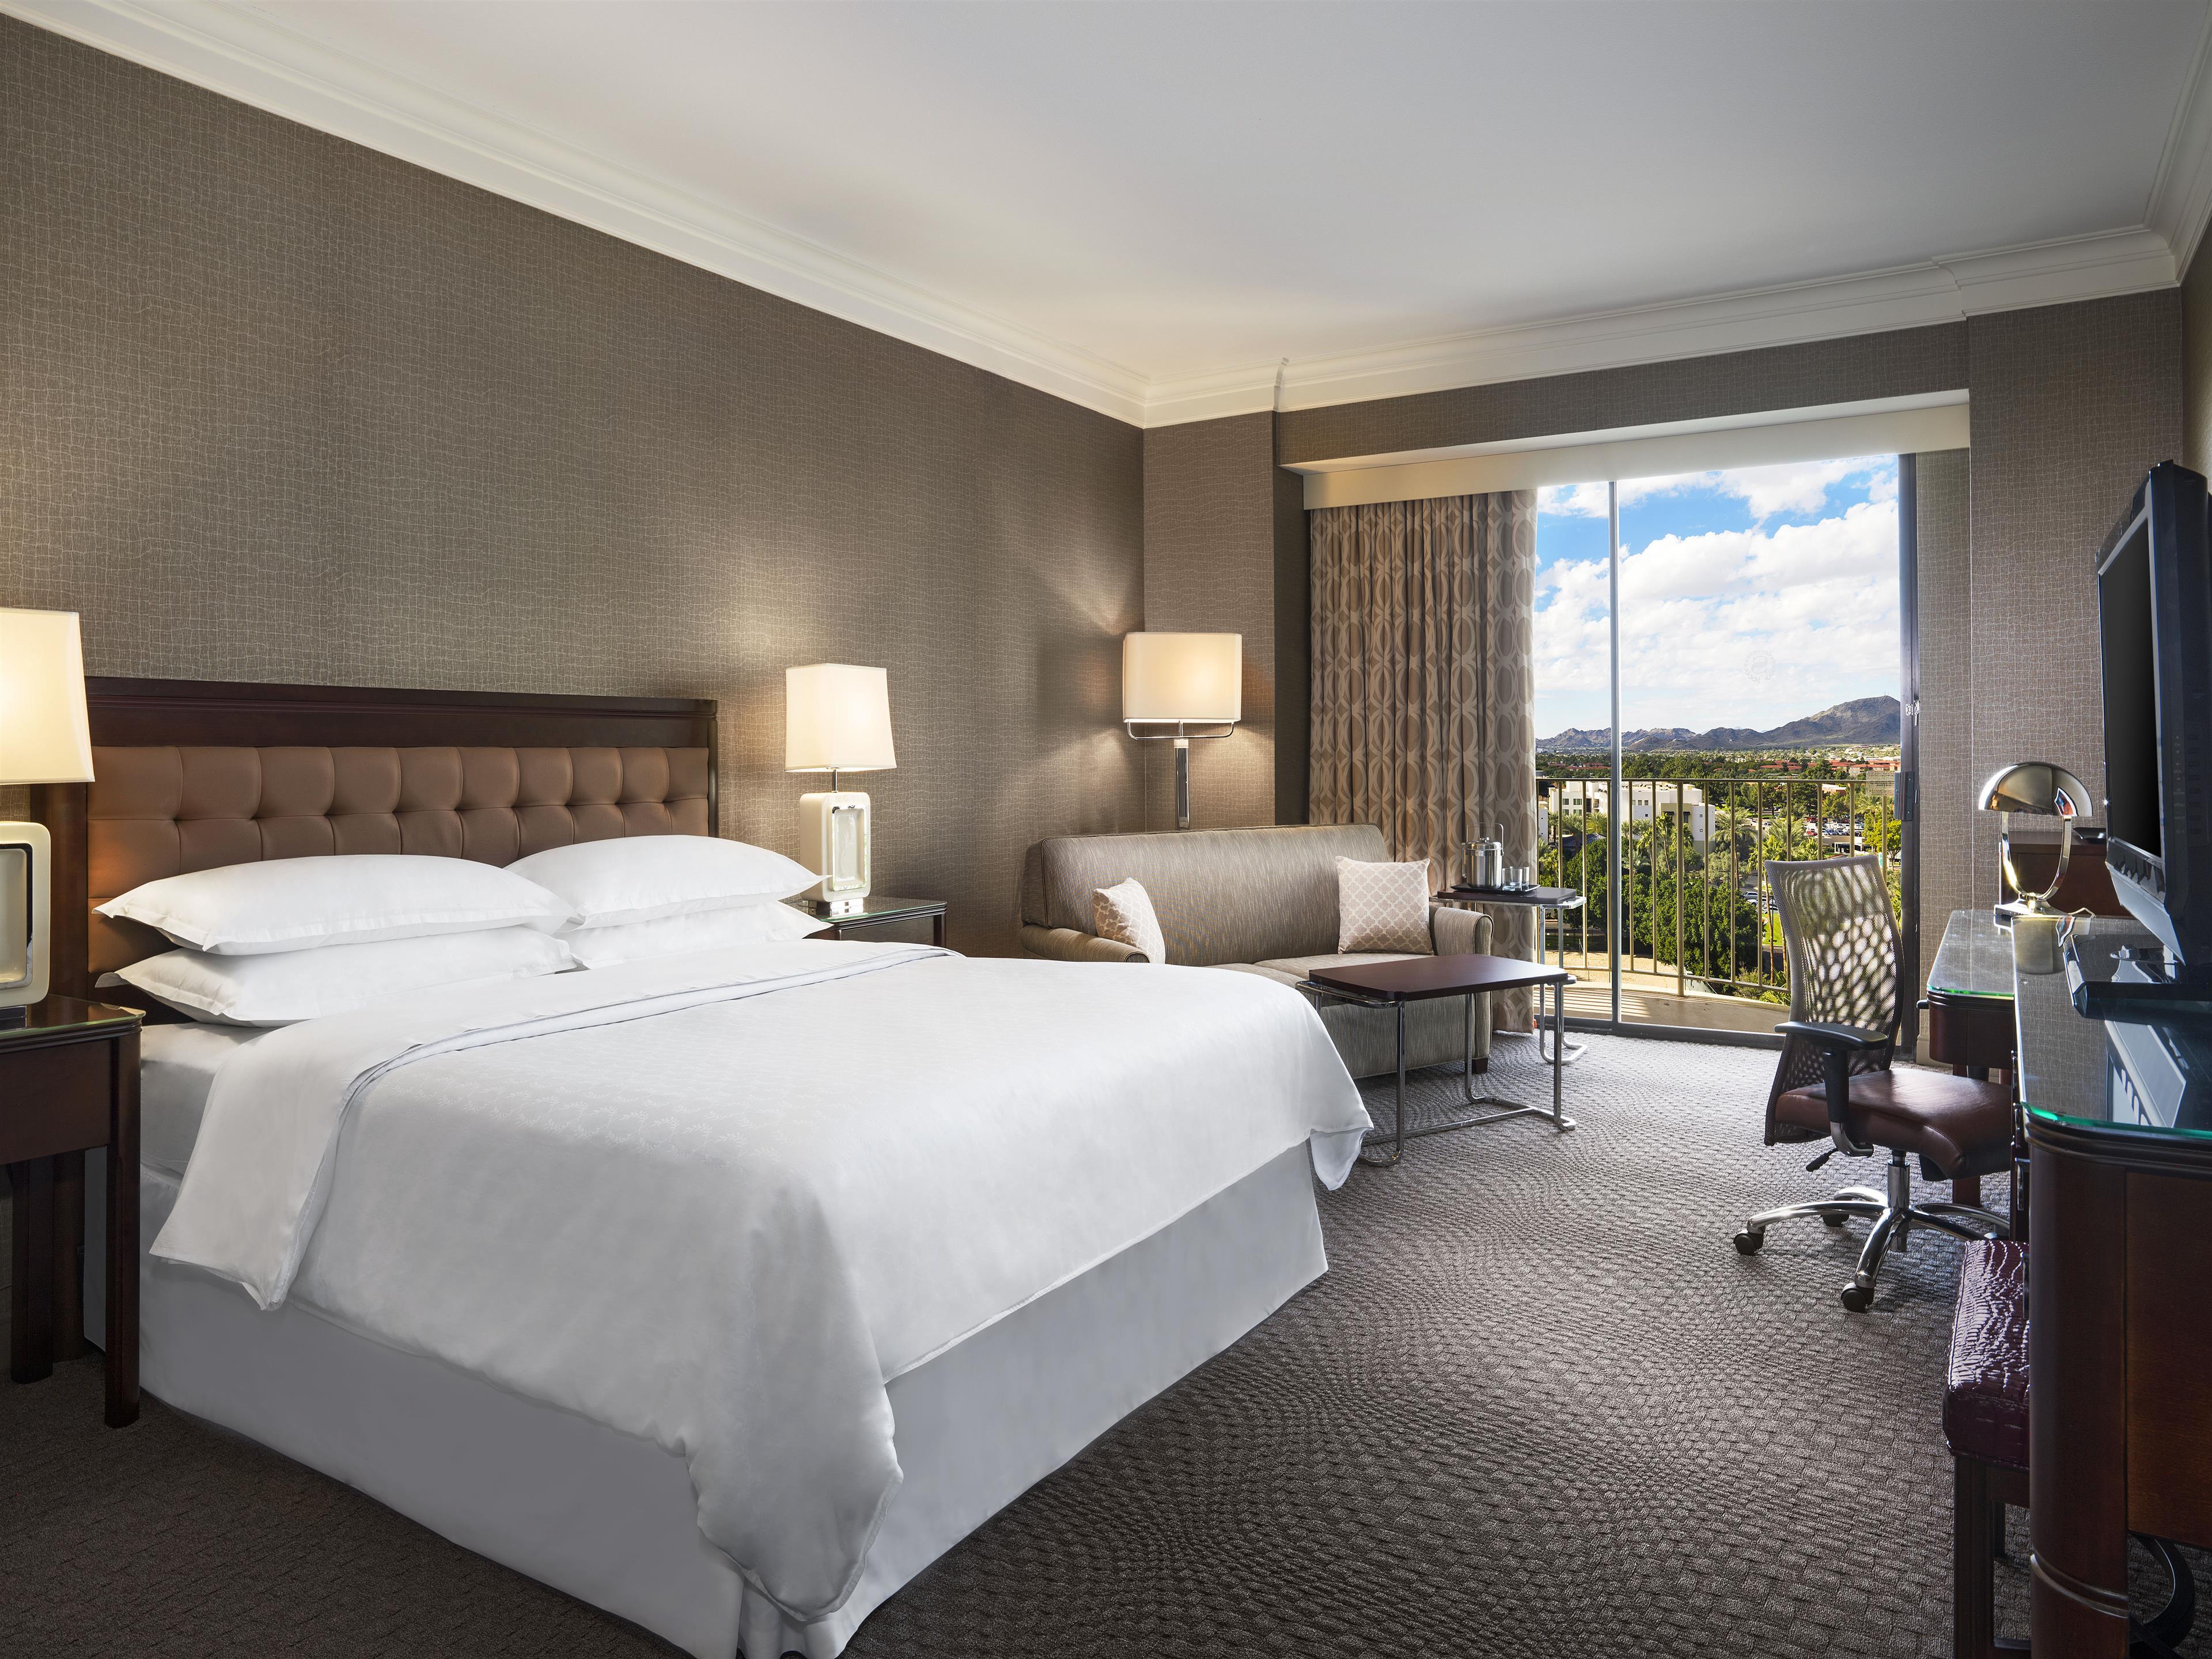 Sheraton Crescent Hotel image 2